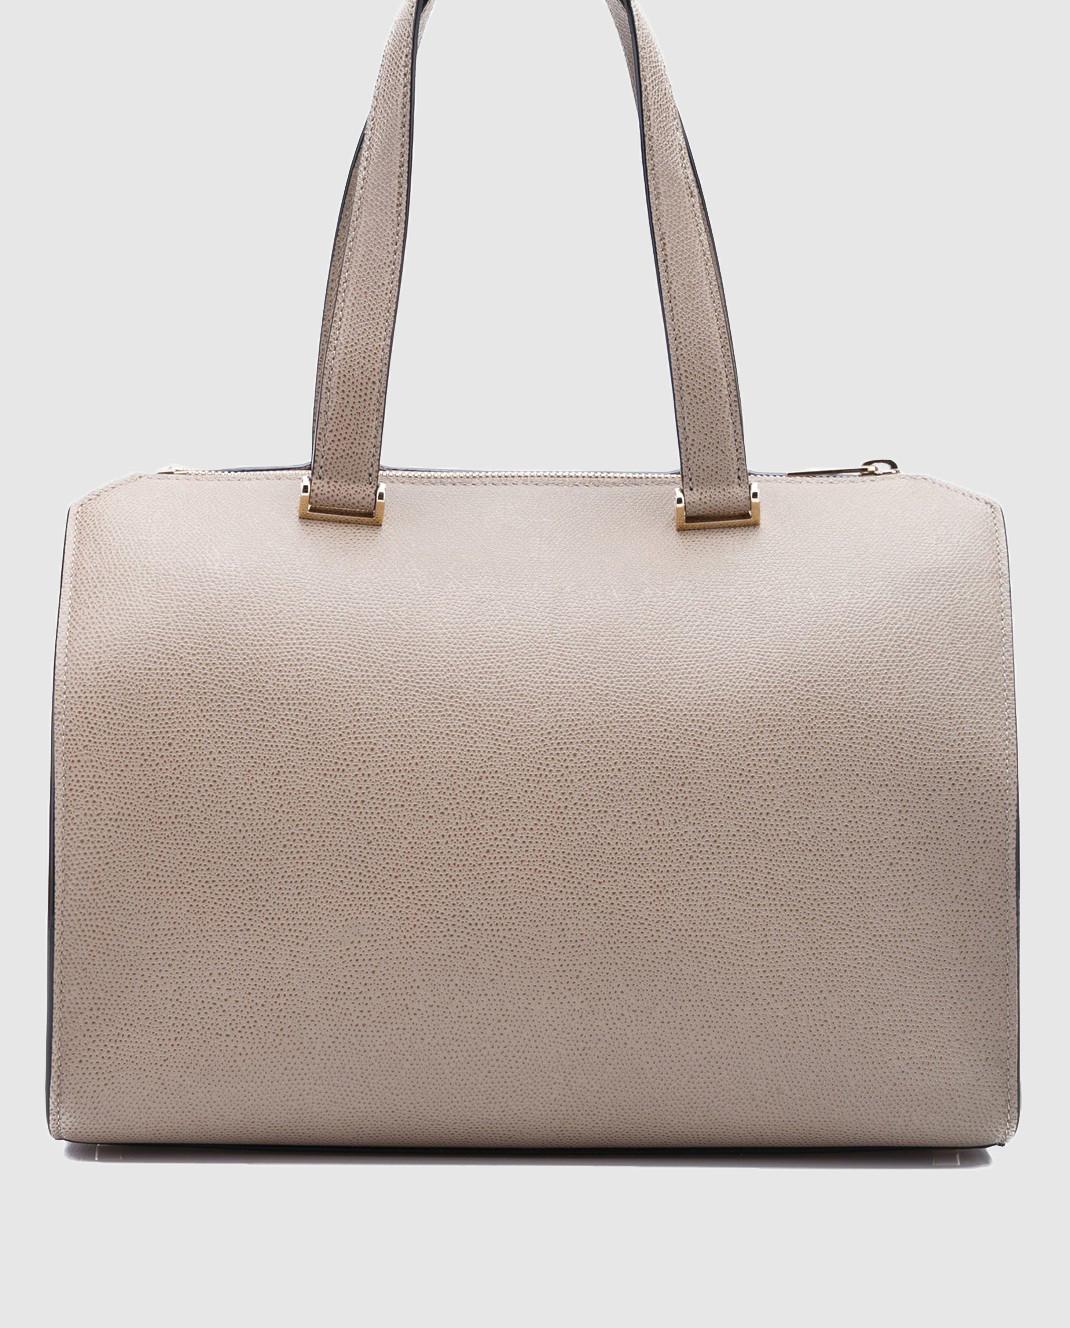 Valextra Бежевая сумка из кожи V5F31 изображение 2